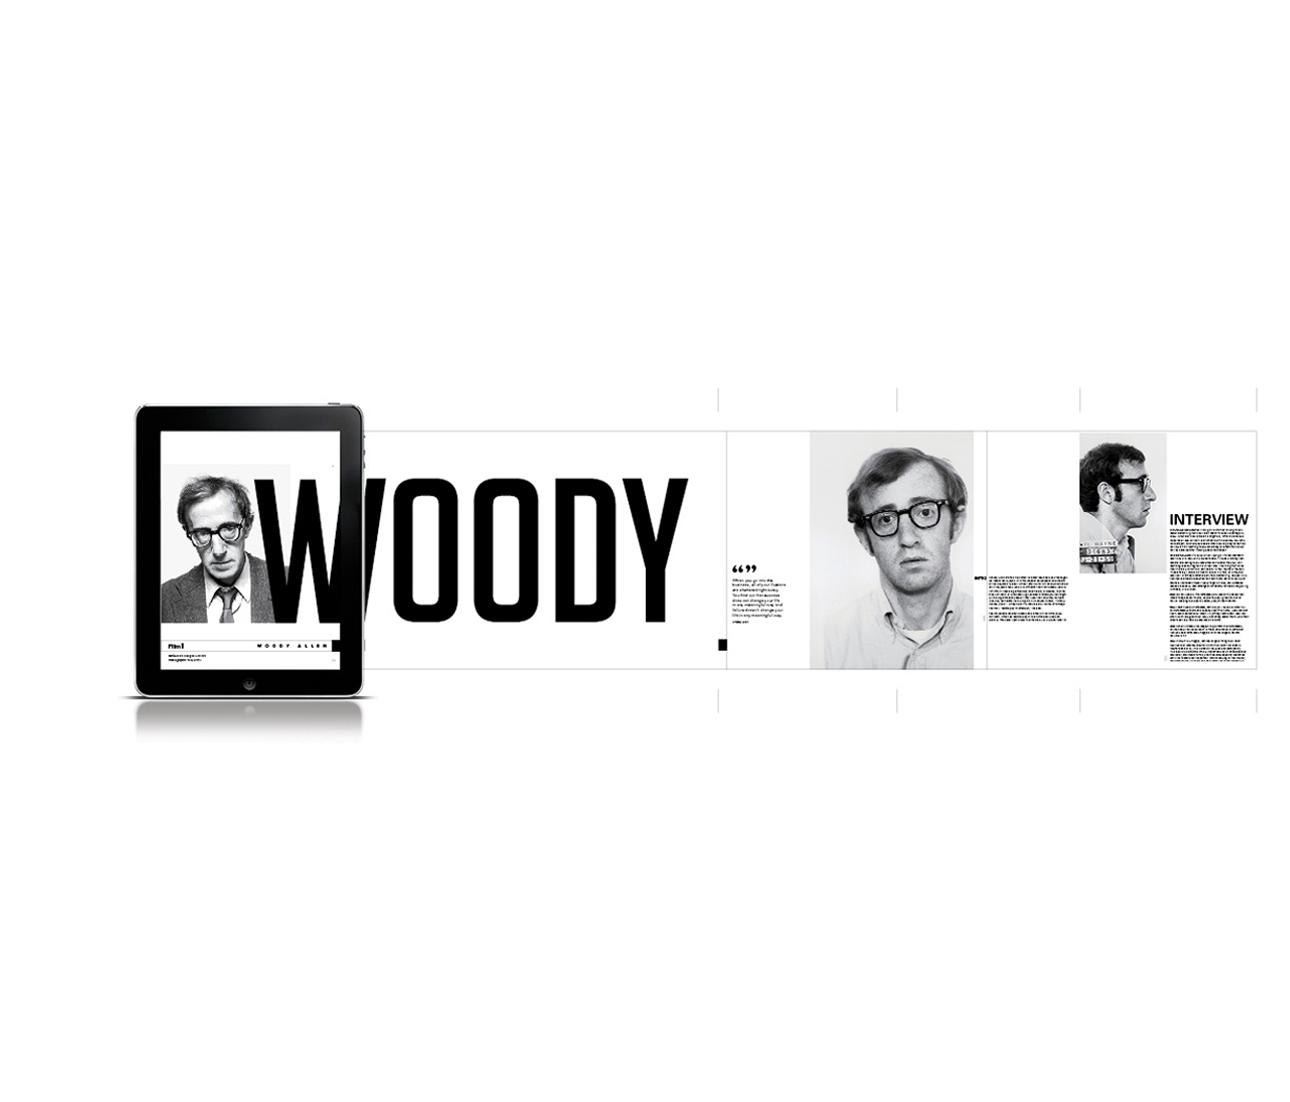 Woody-2.png